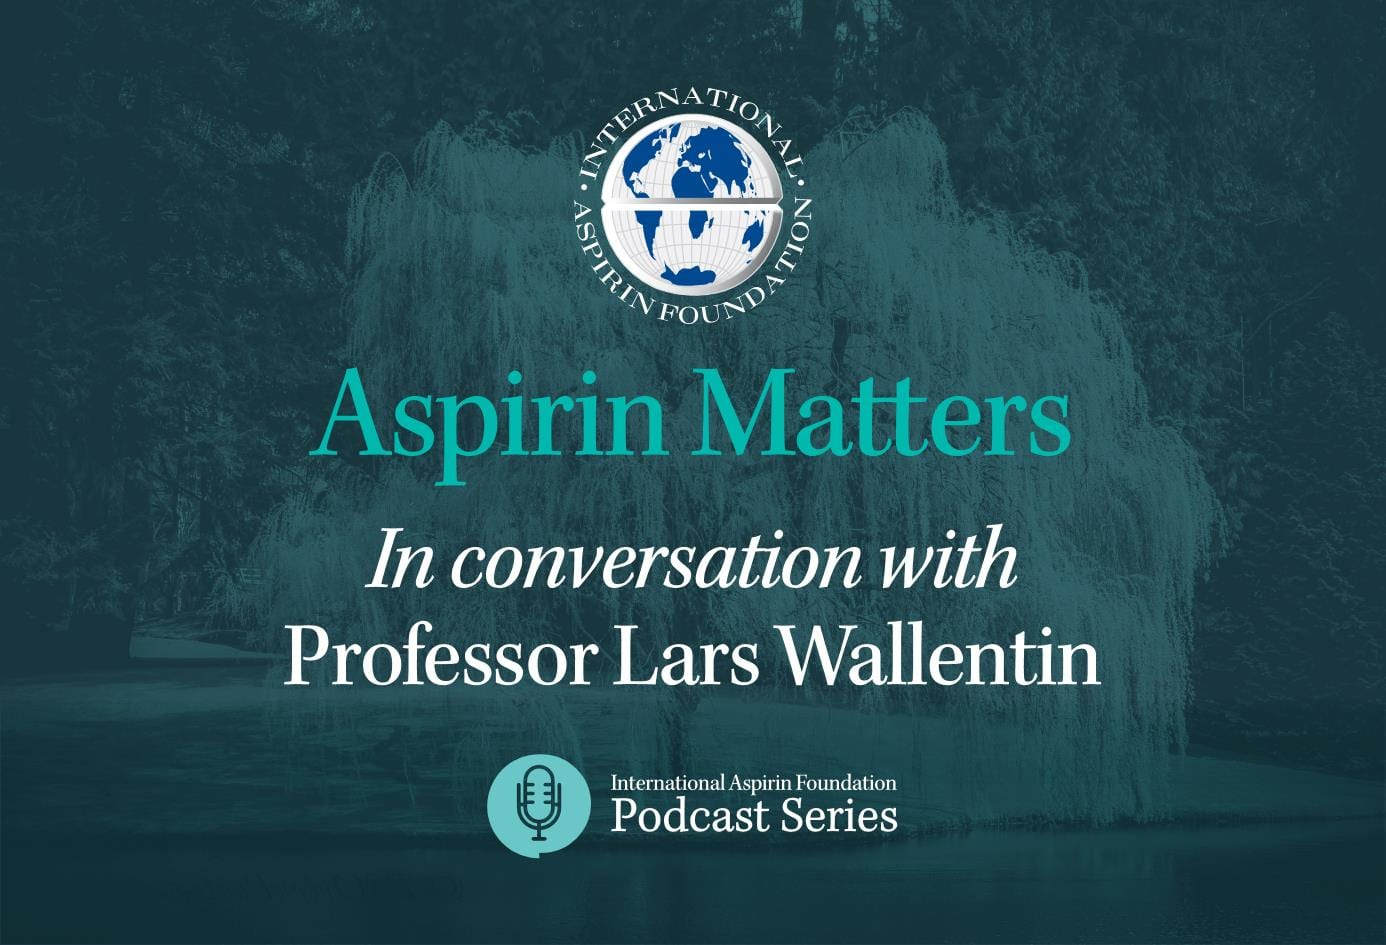 Aspirin Matter Podcasts 240221 Page 1